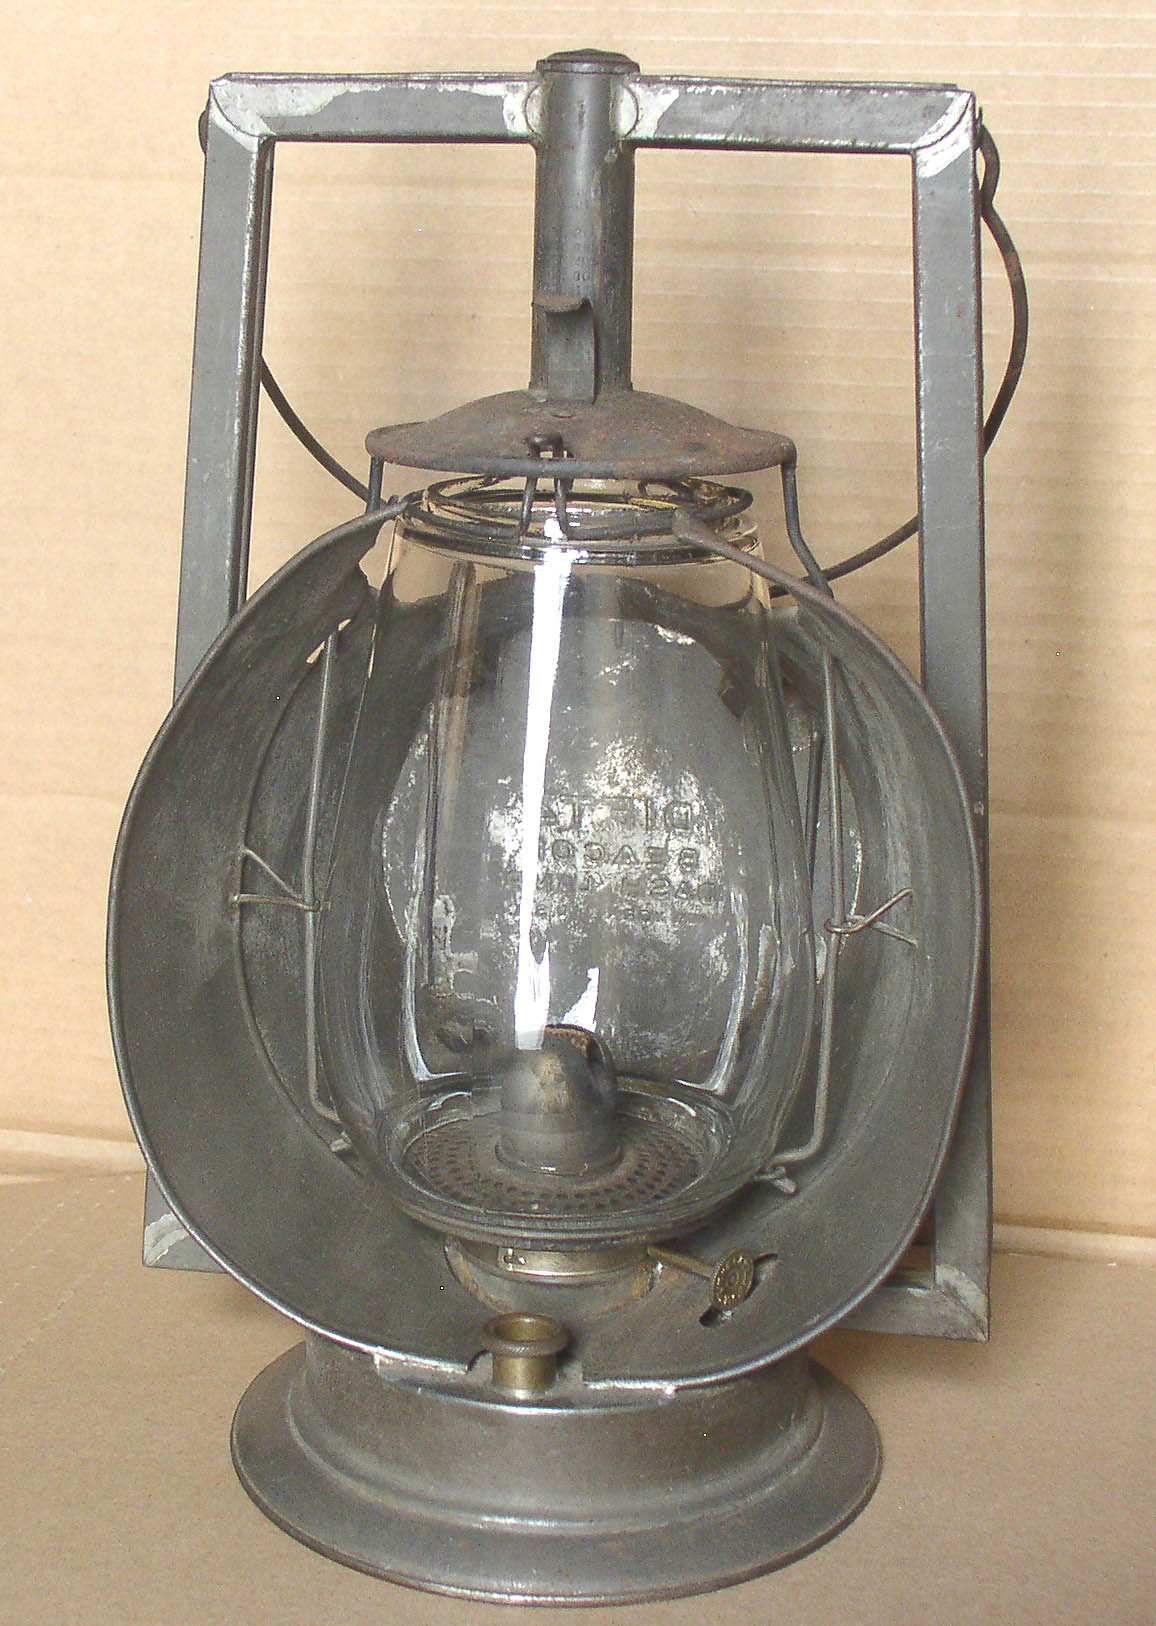 R.E. Dietz Kerosene Lanterns Compendium